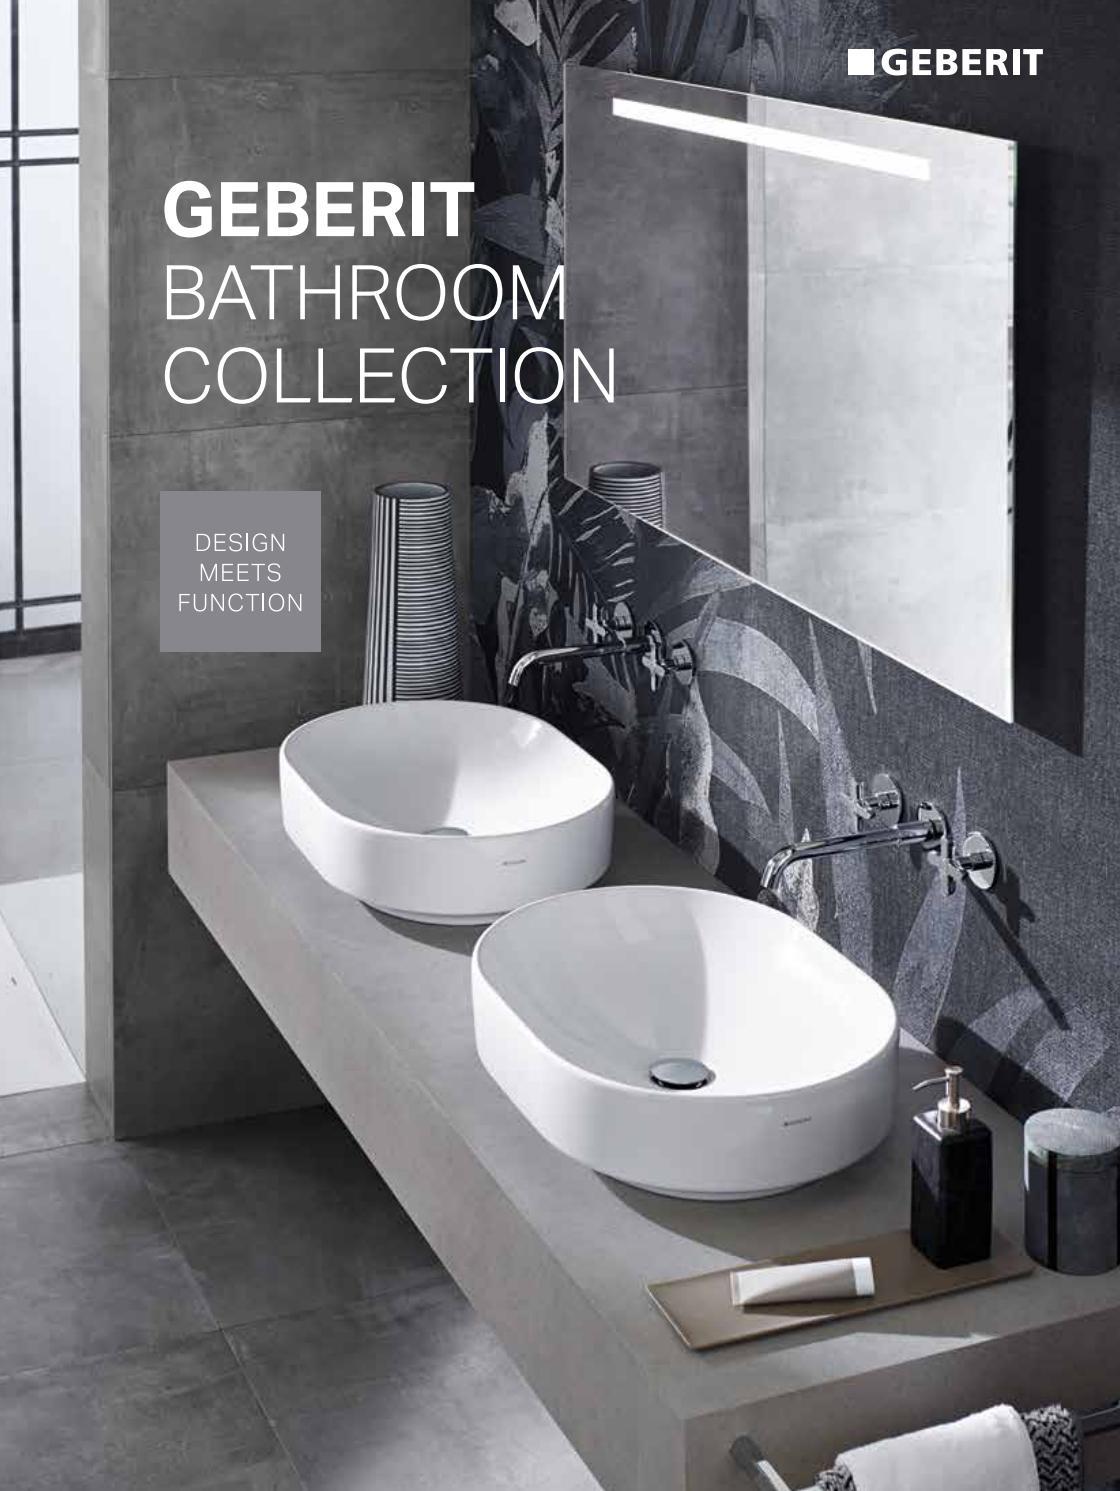 Largeur Wc Suspendu Geberit pdf fr geberit bathroom collectiontophotelsupplier - issuu